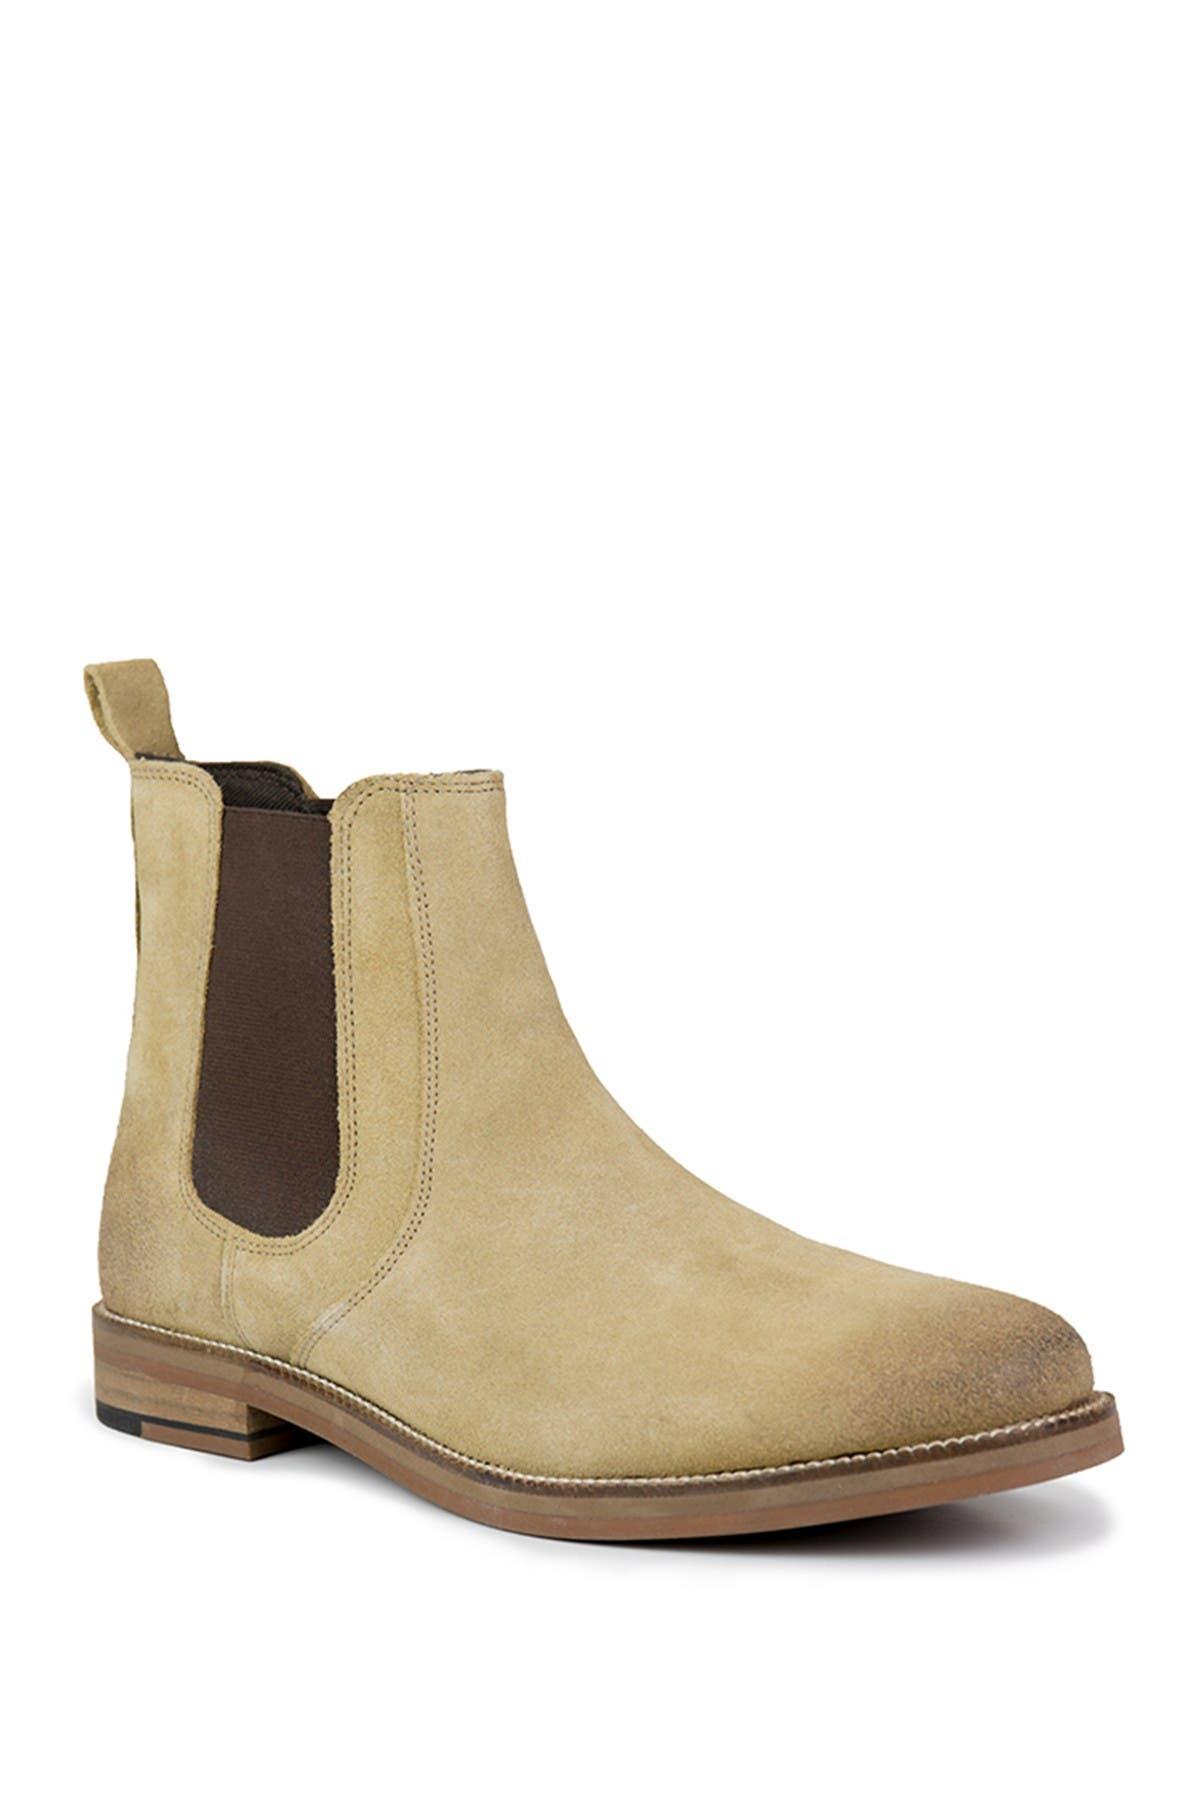 Image of Crevo Denham Chelsea Boot